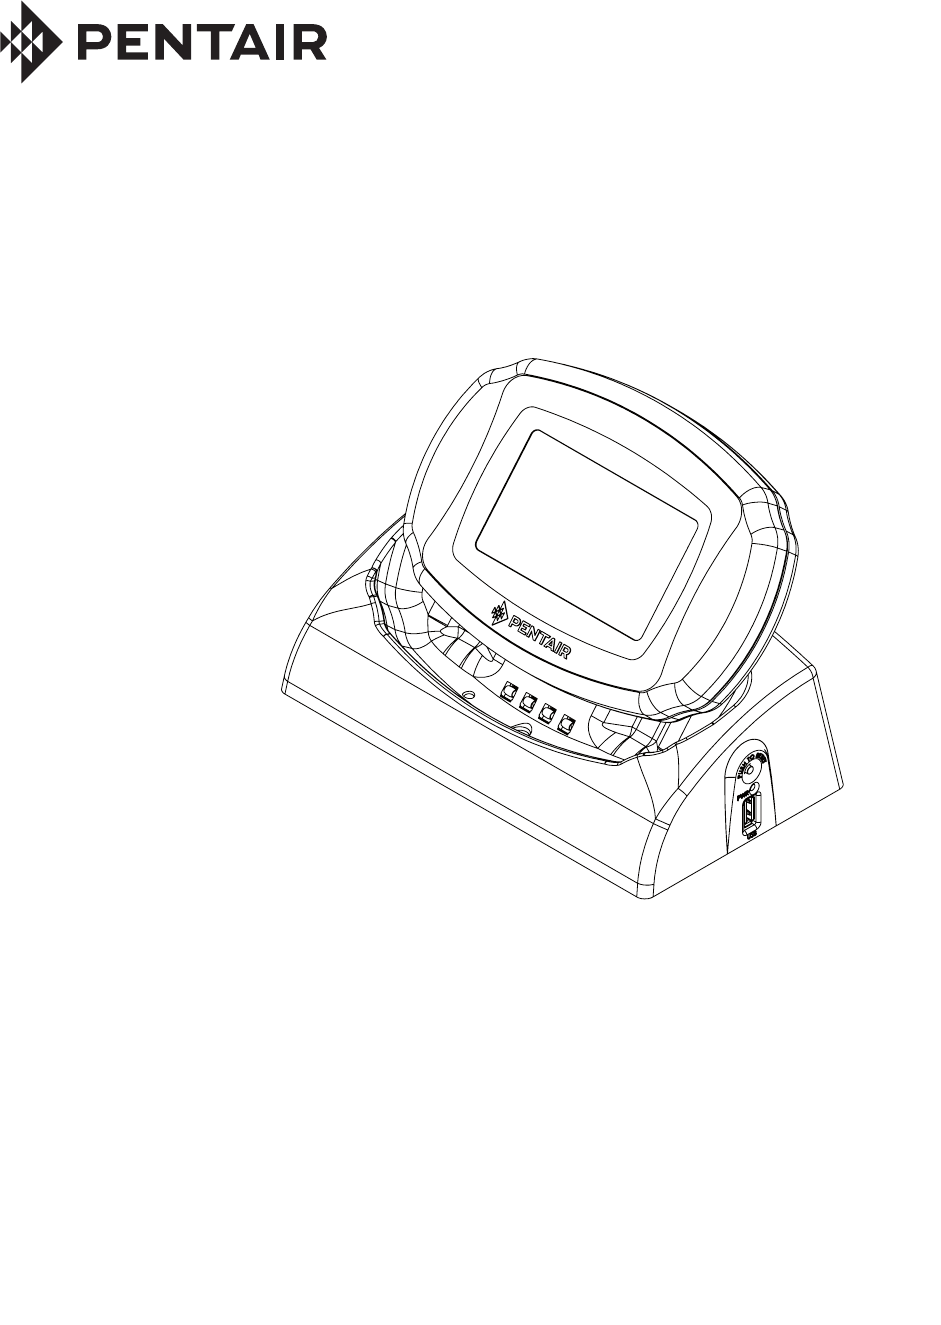 Pentair Aquatic Systems ICHNDHLD IntelliCenter Wireless